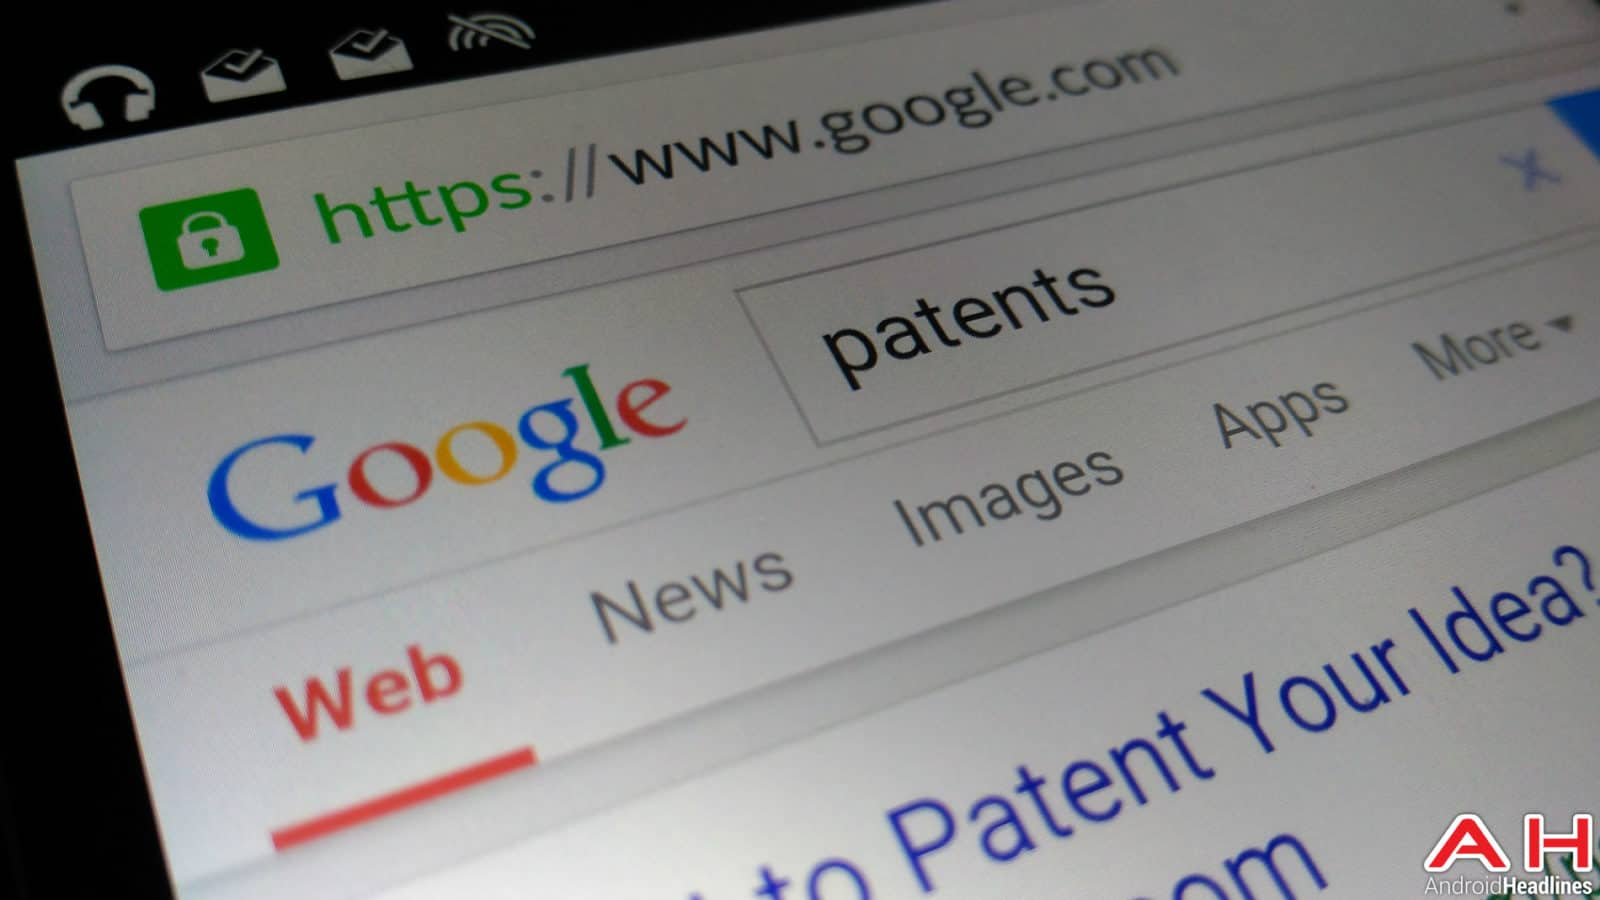 Google Patents AH